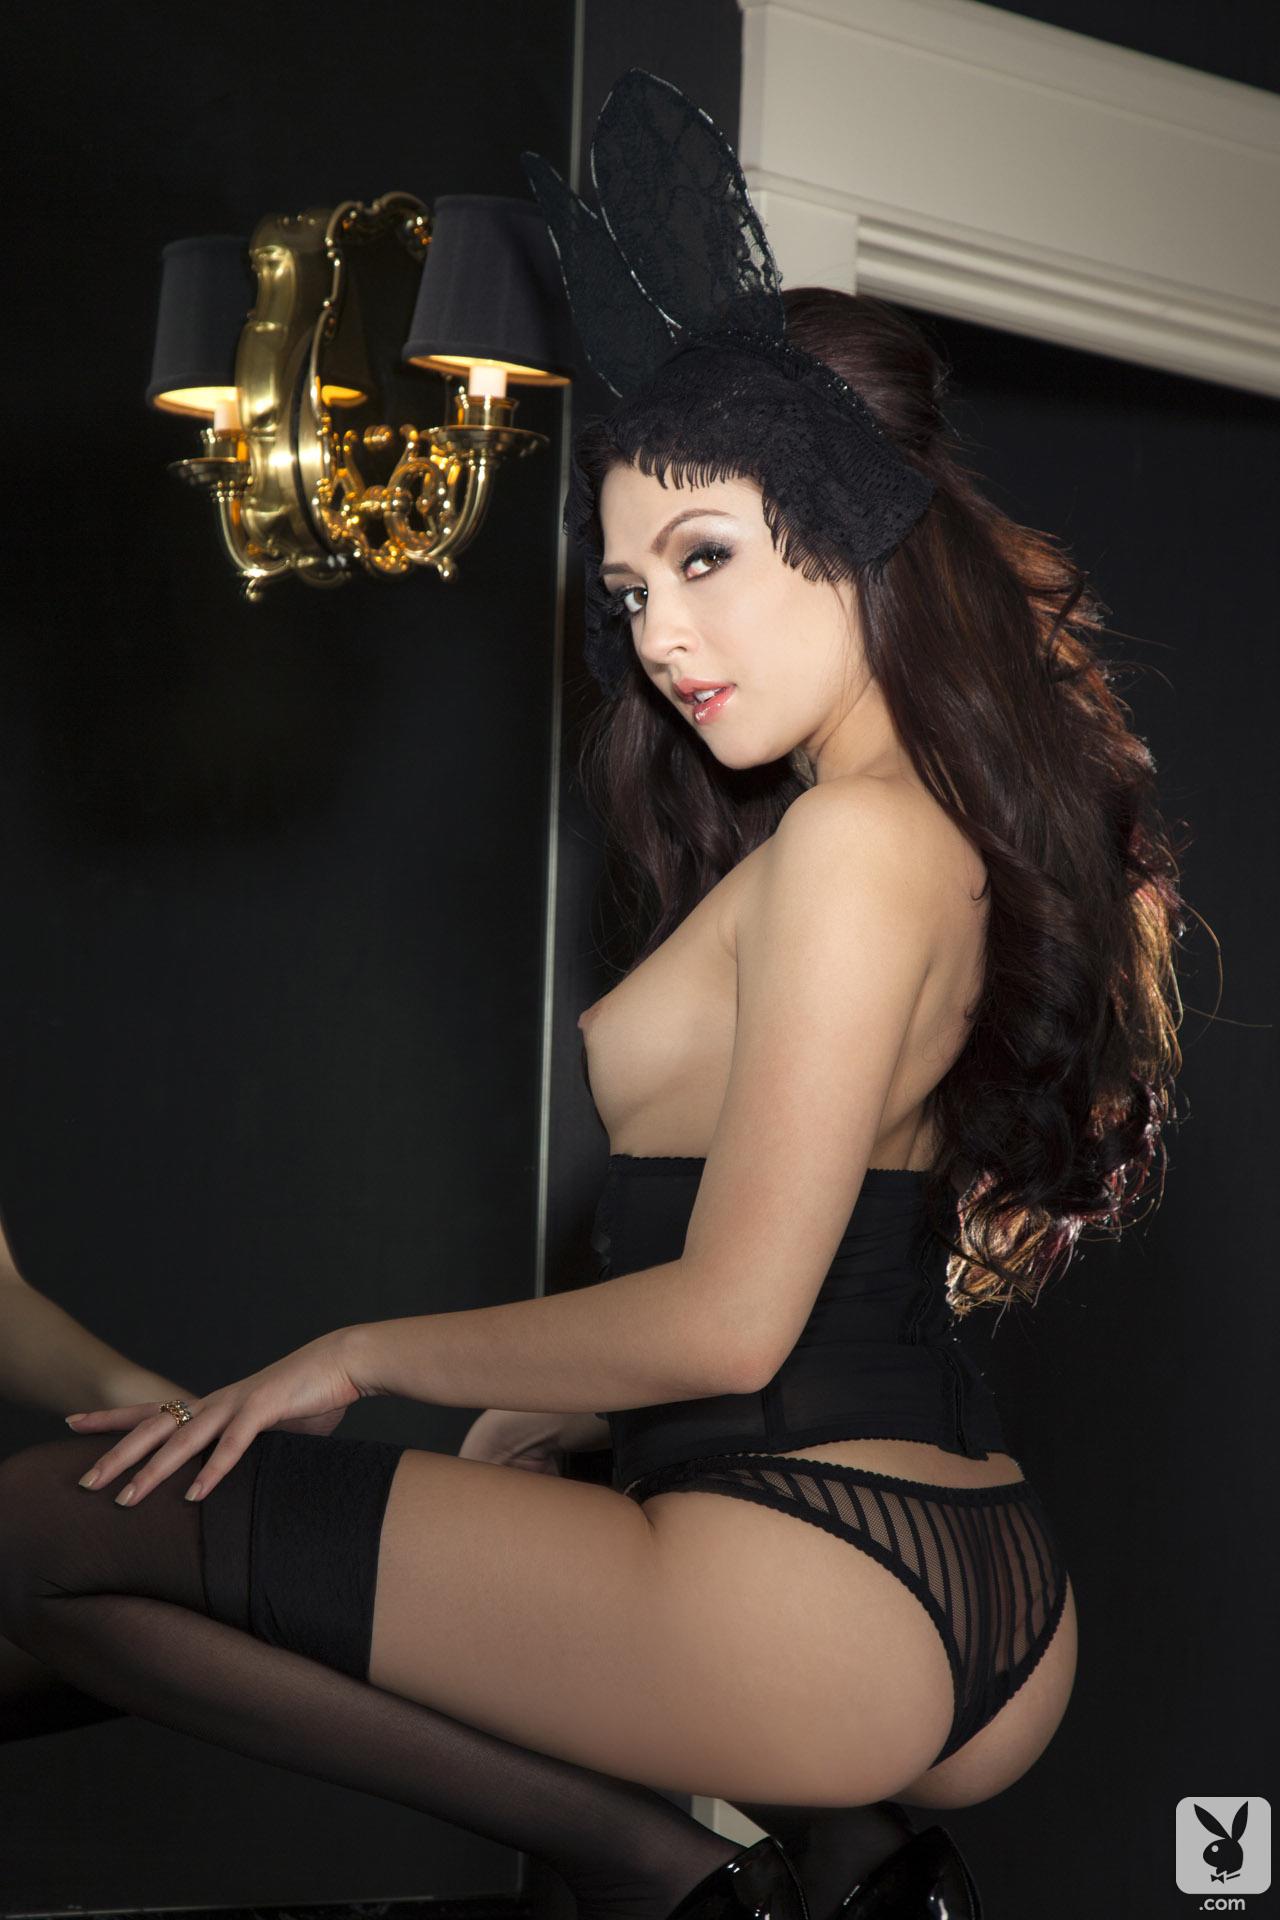 topless Playboy bunny